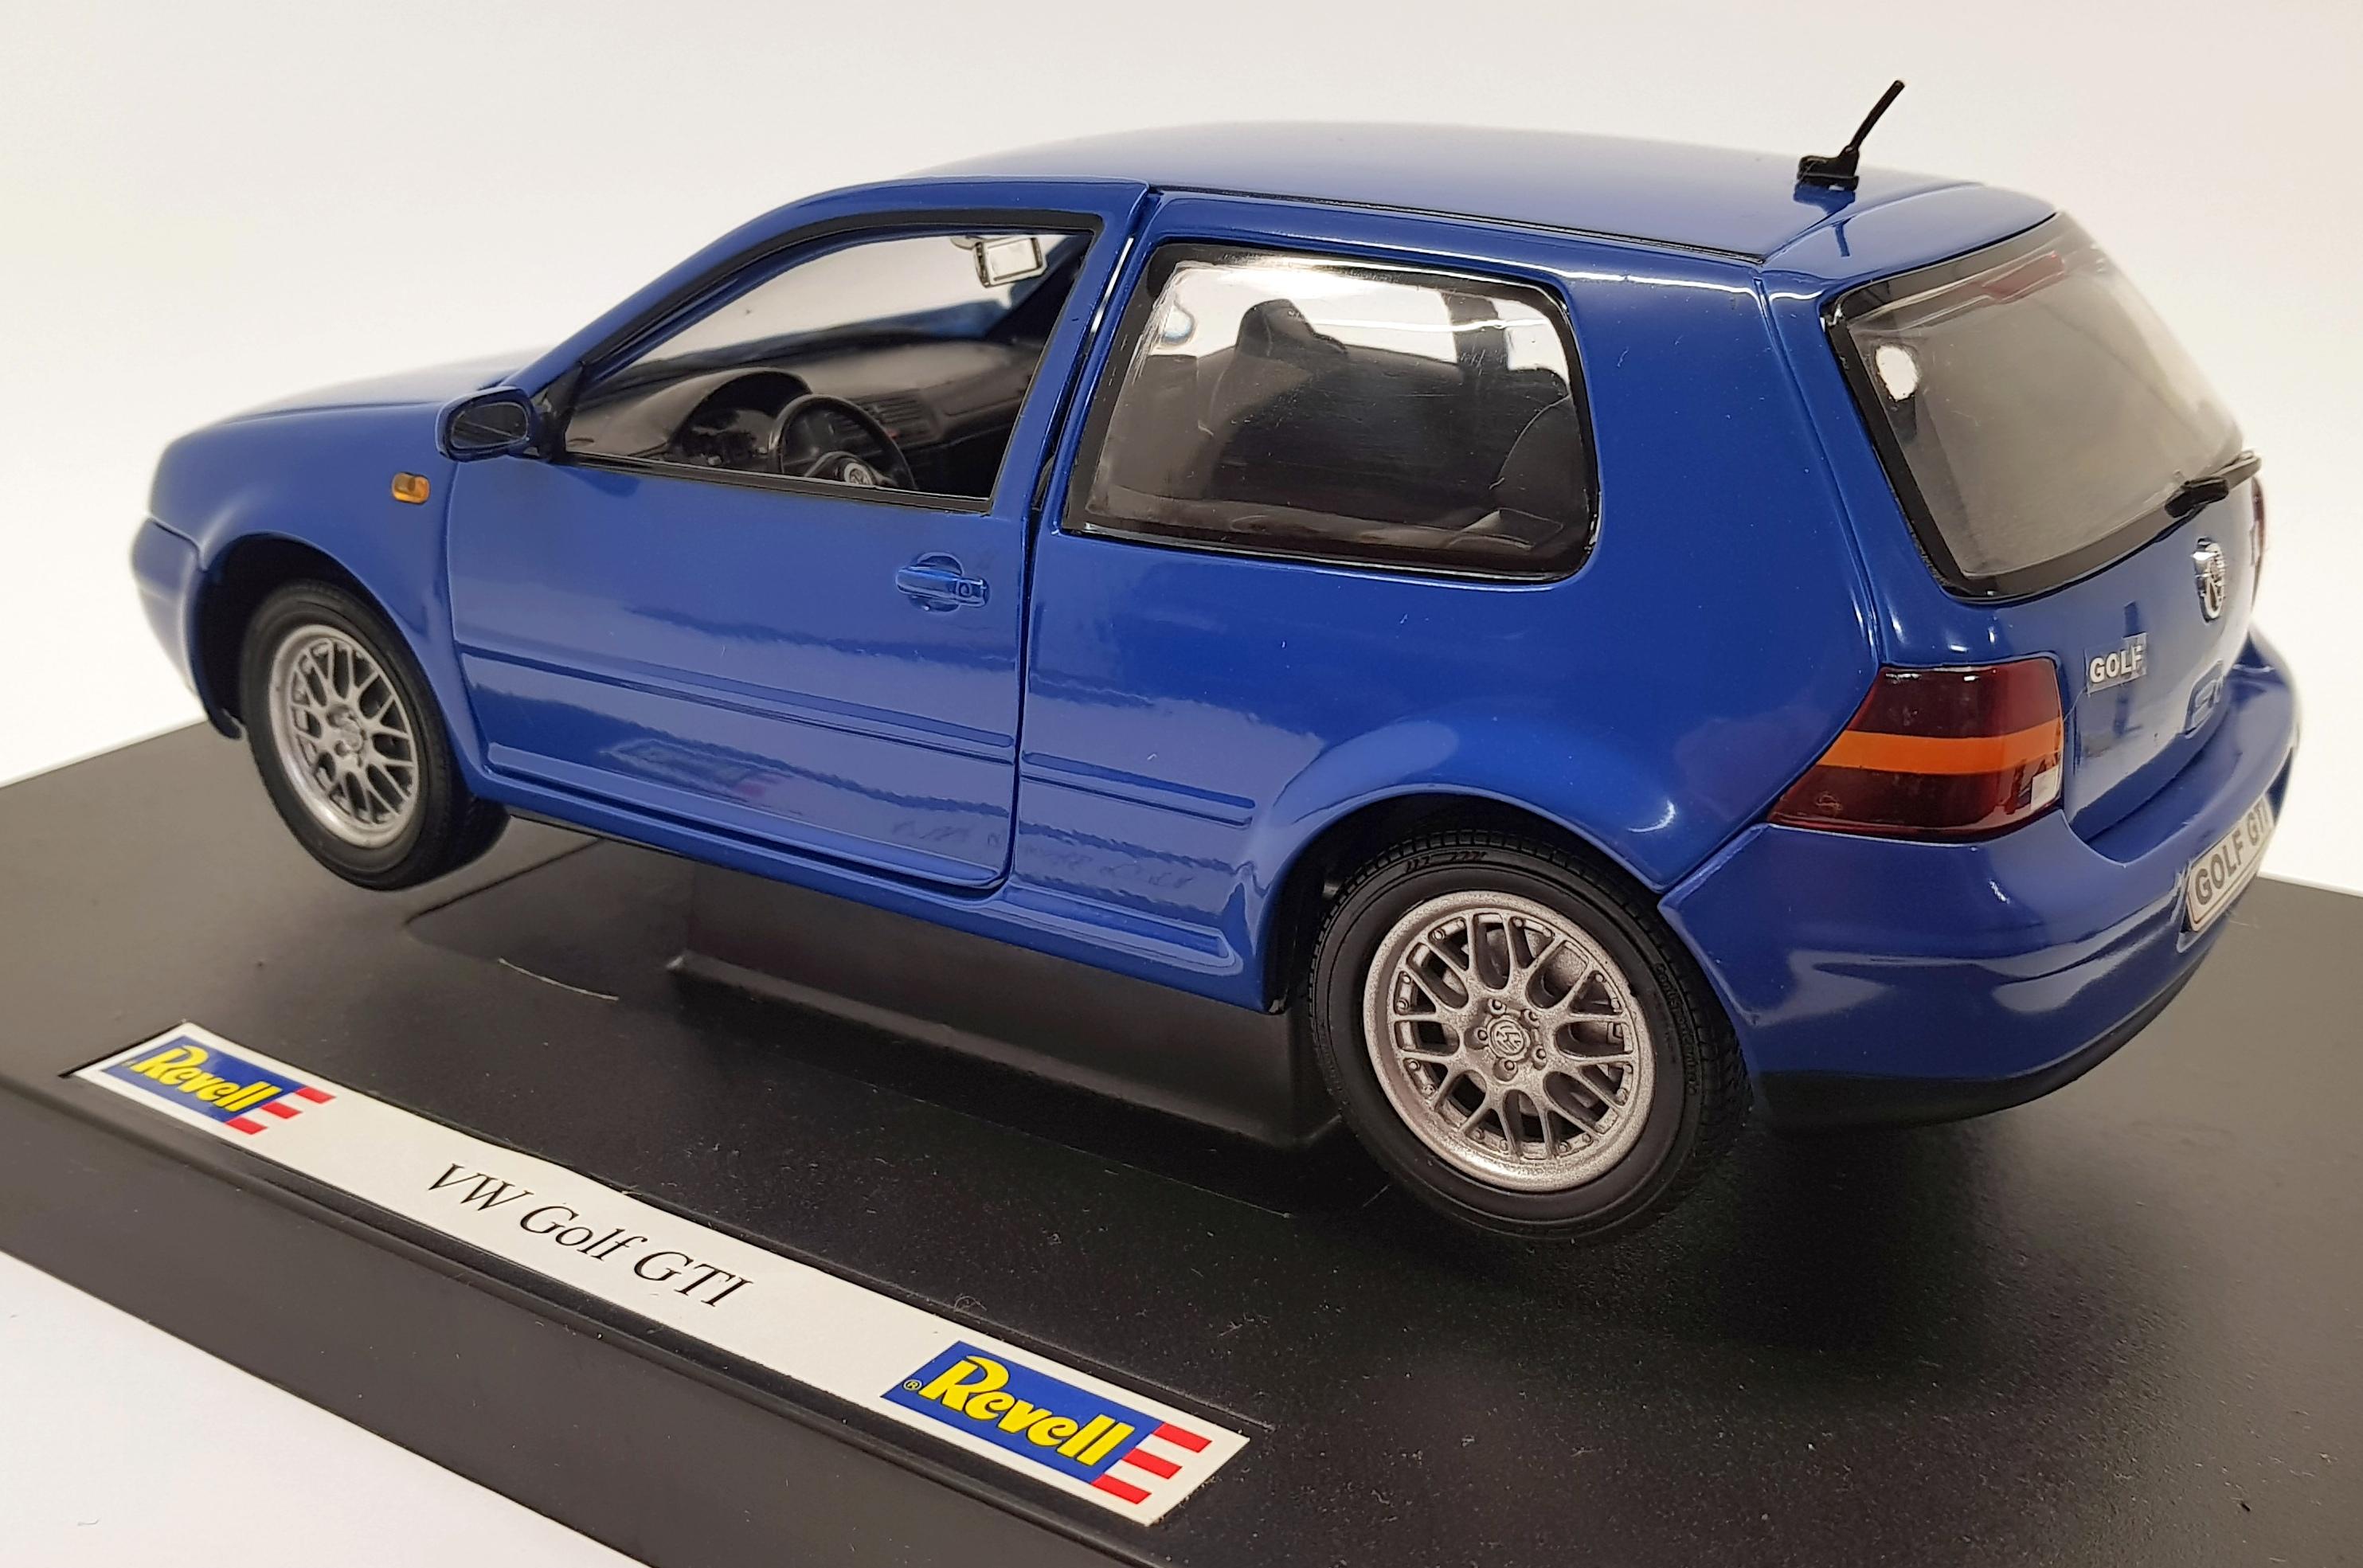 Awm VW Bora azul